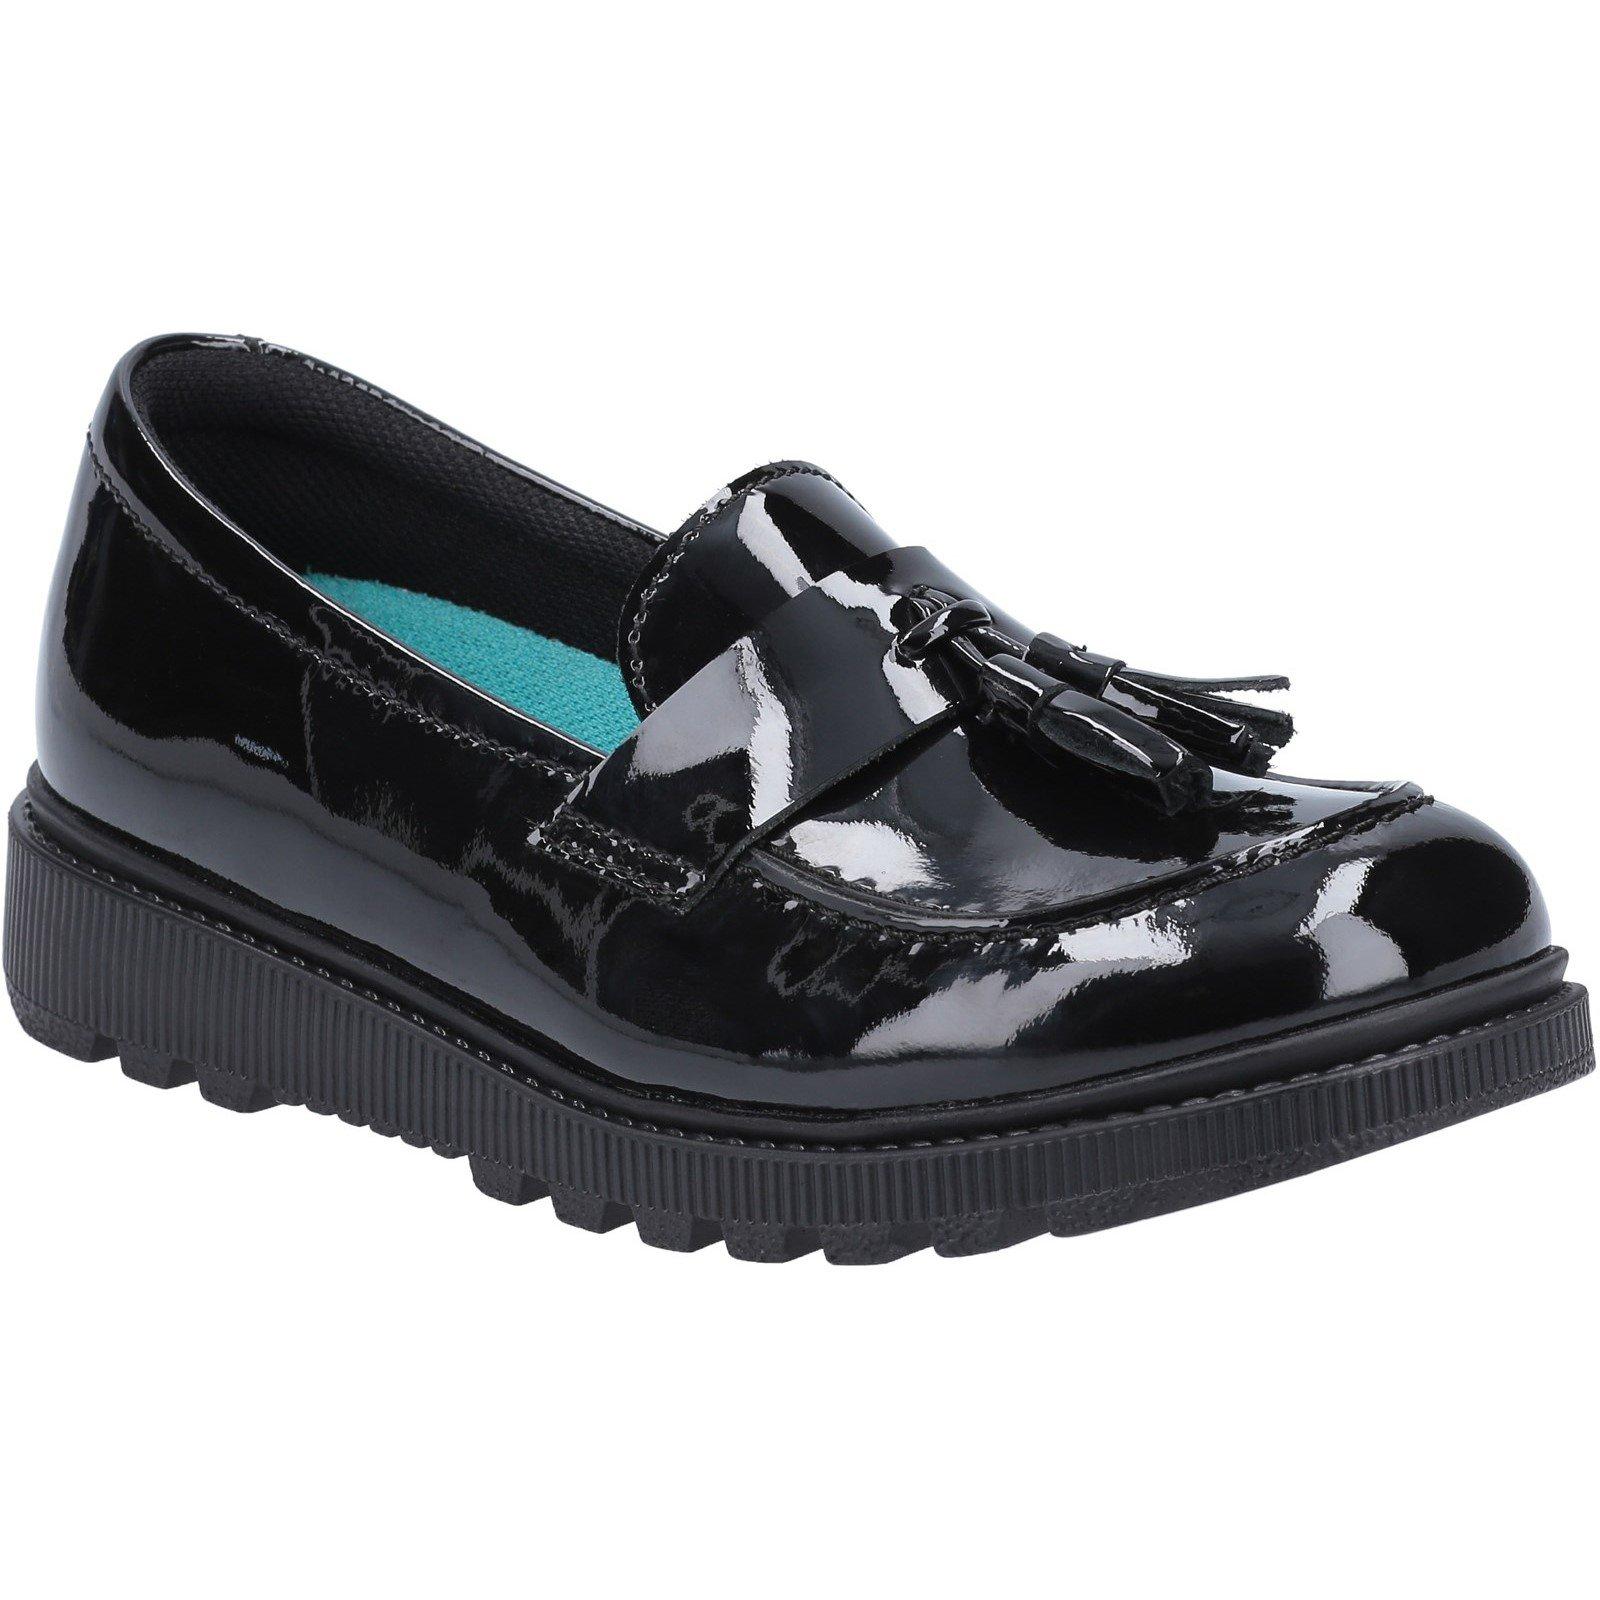 Hush Puppies Kid's Karen Junior School Shoe Patent Black 30827 - Patent Black 11